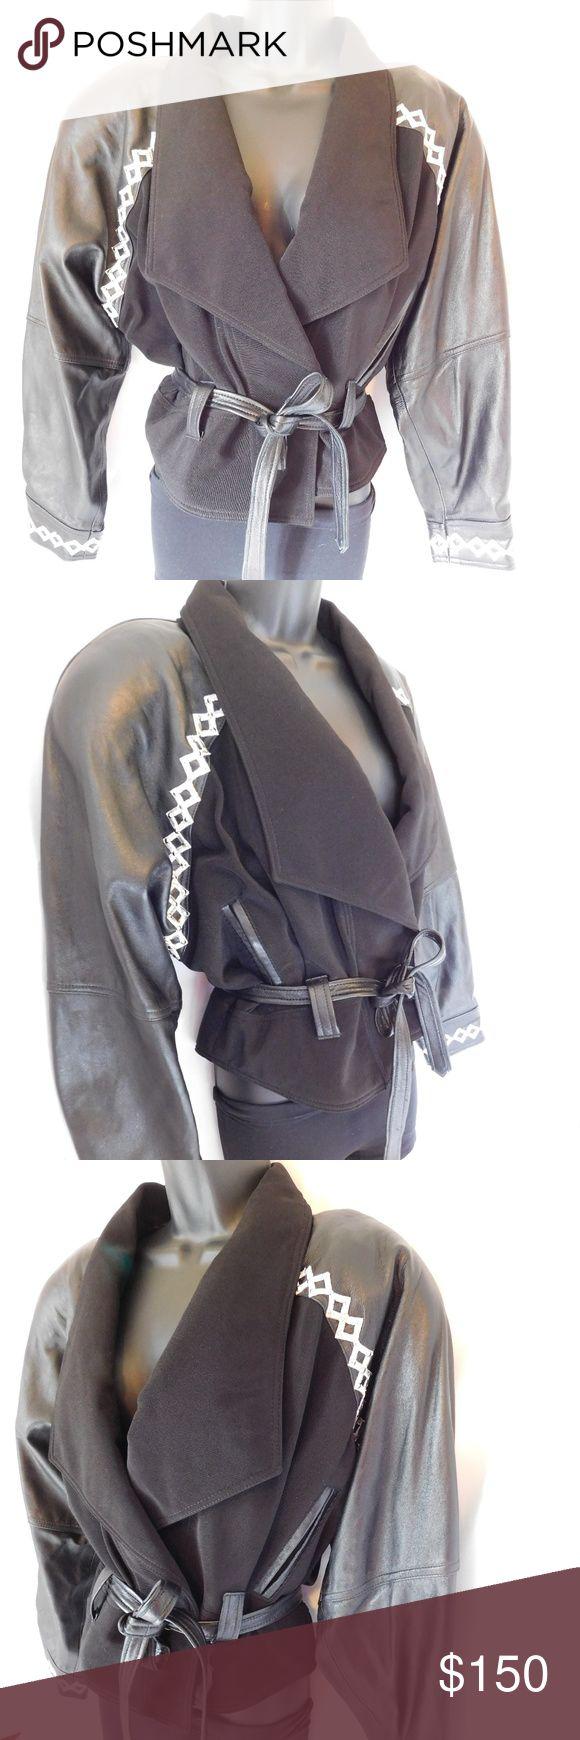 VINTAGE CACHE BLACK LEATHER JACKET Brand CACHE' Style